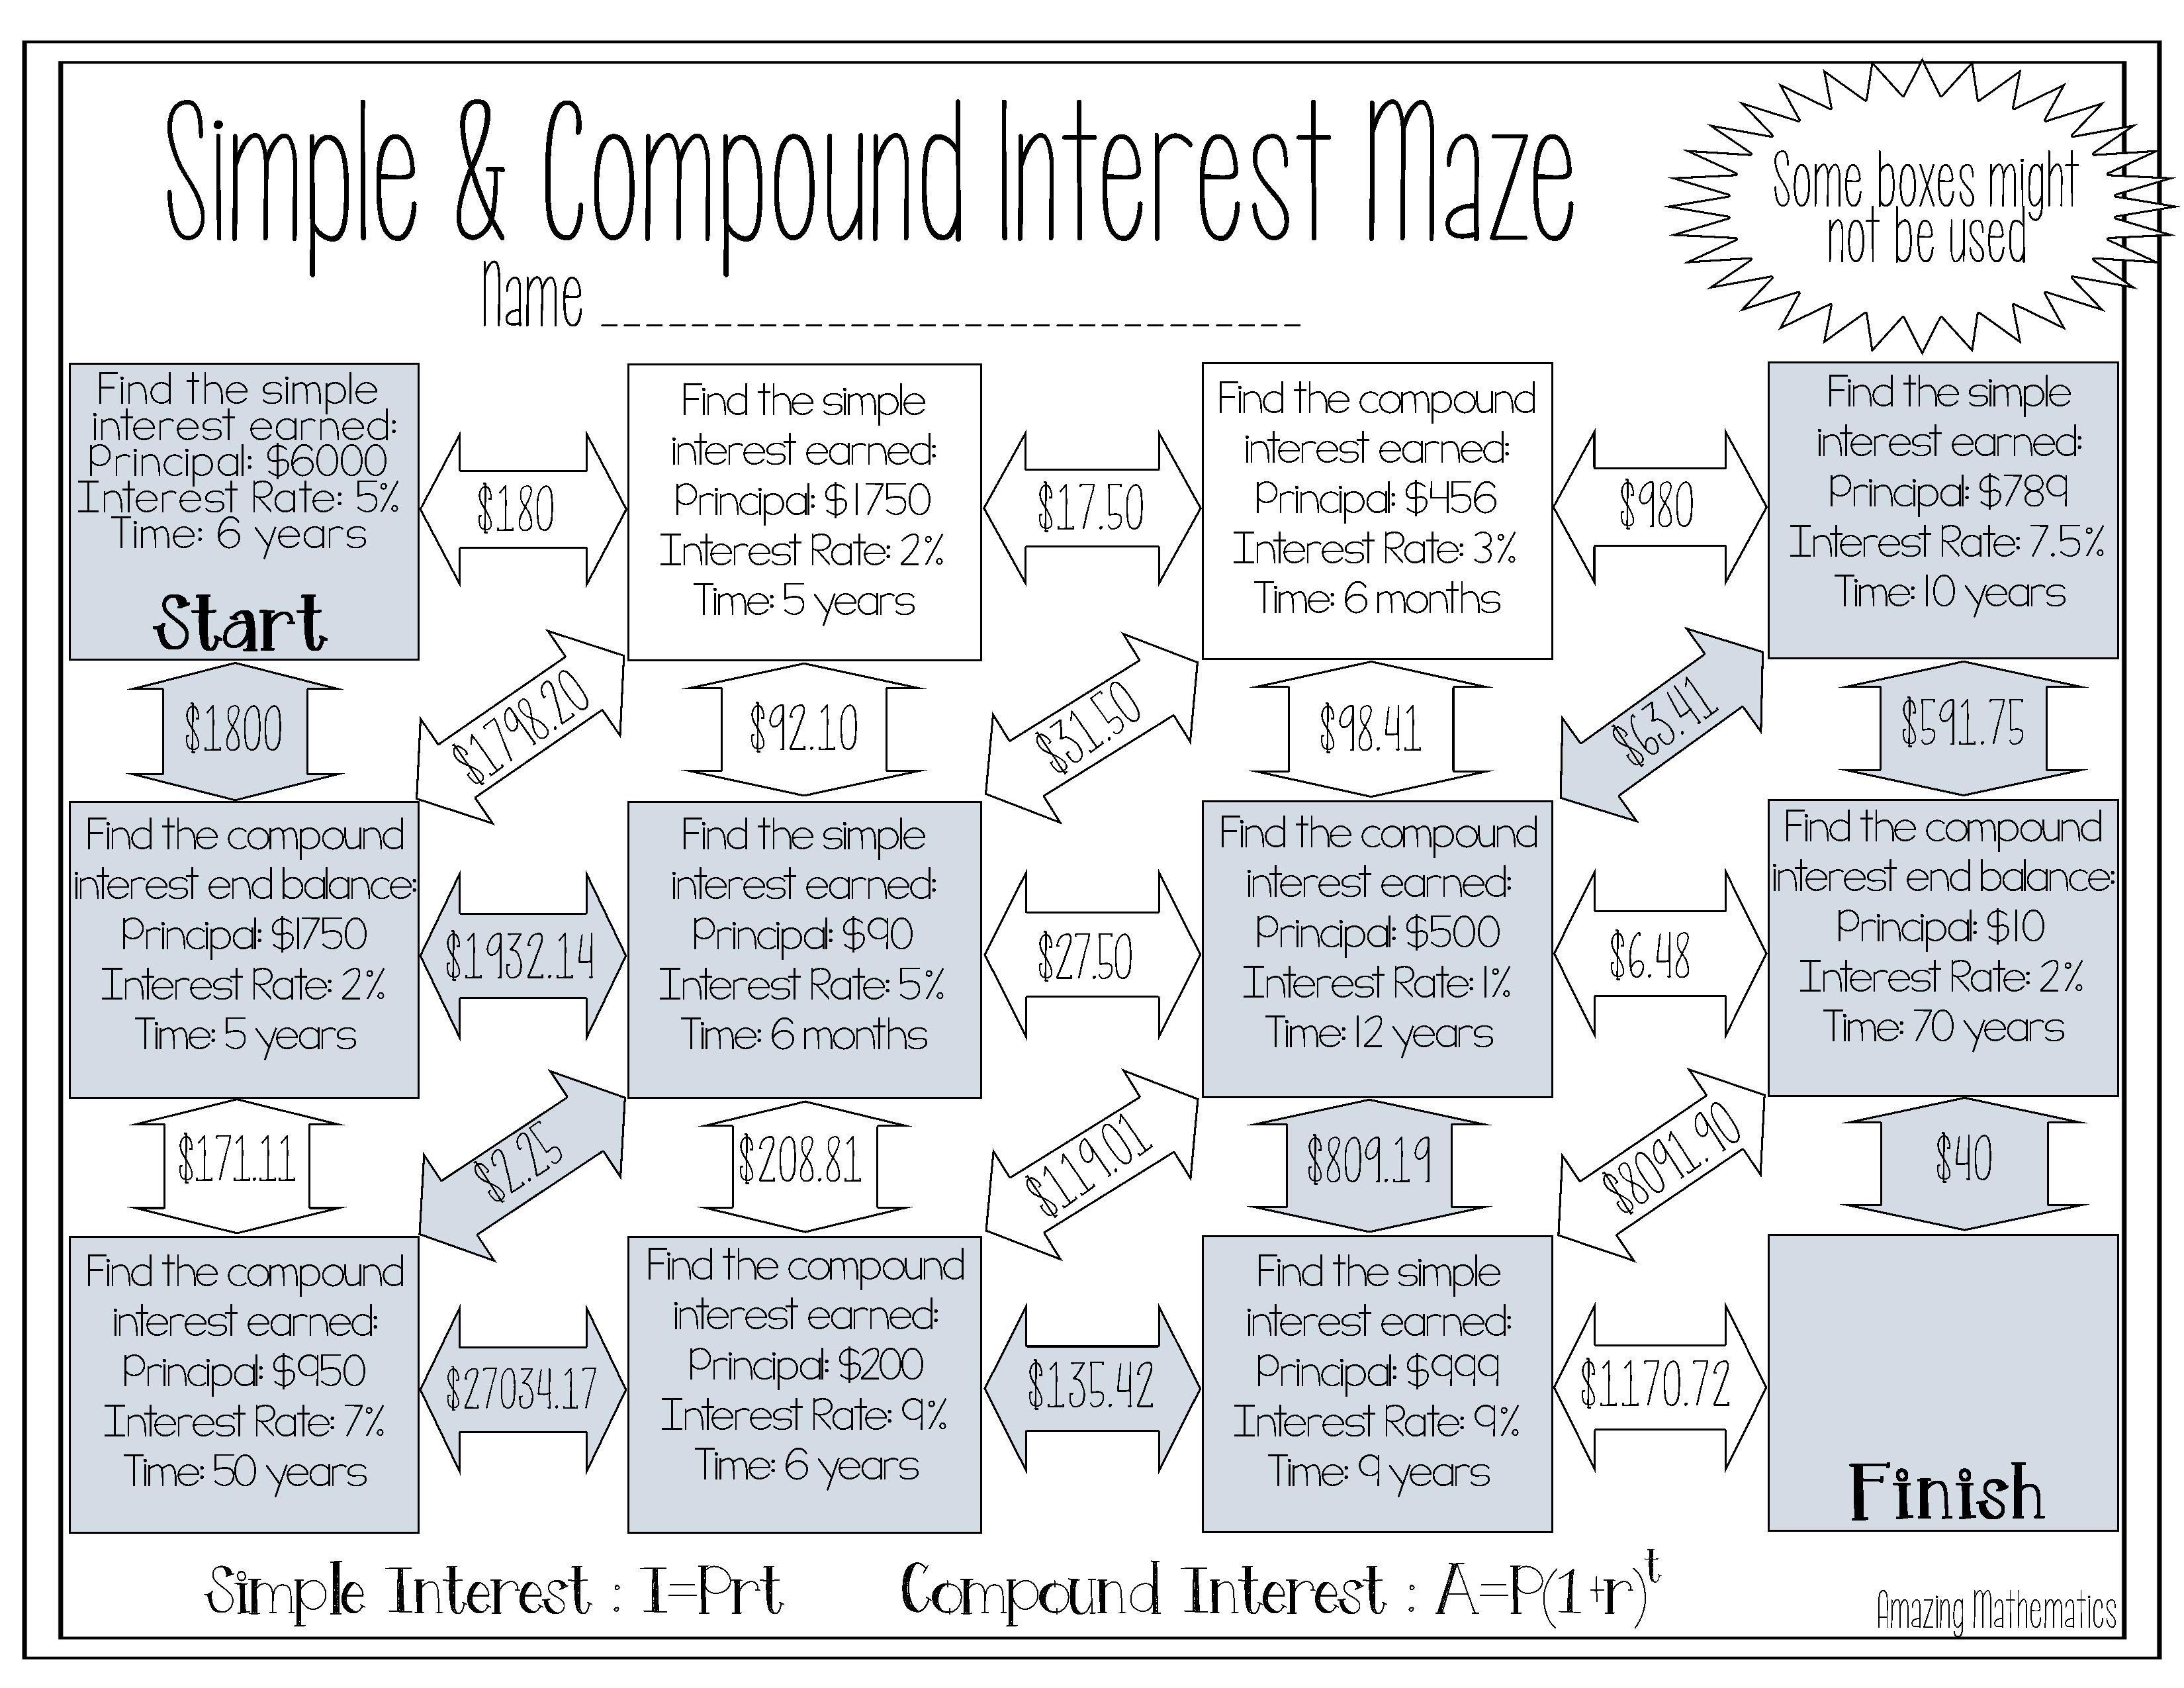 Simple Amp Compound Interest Maze